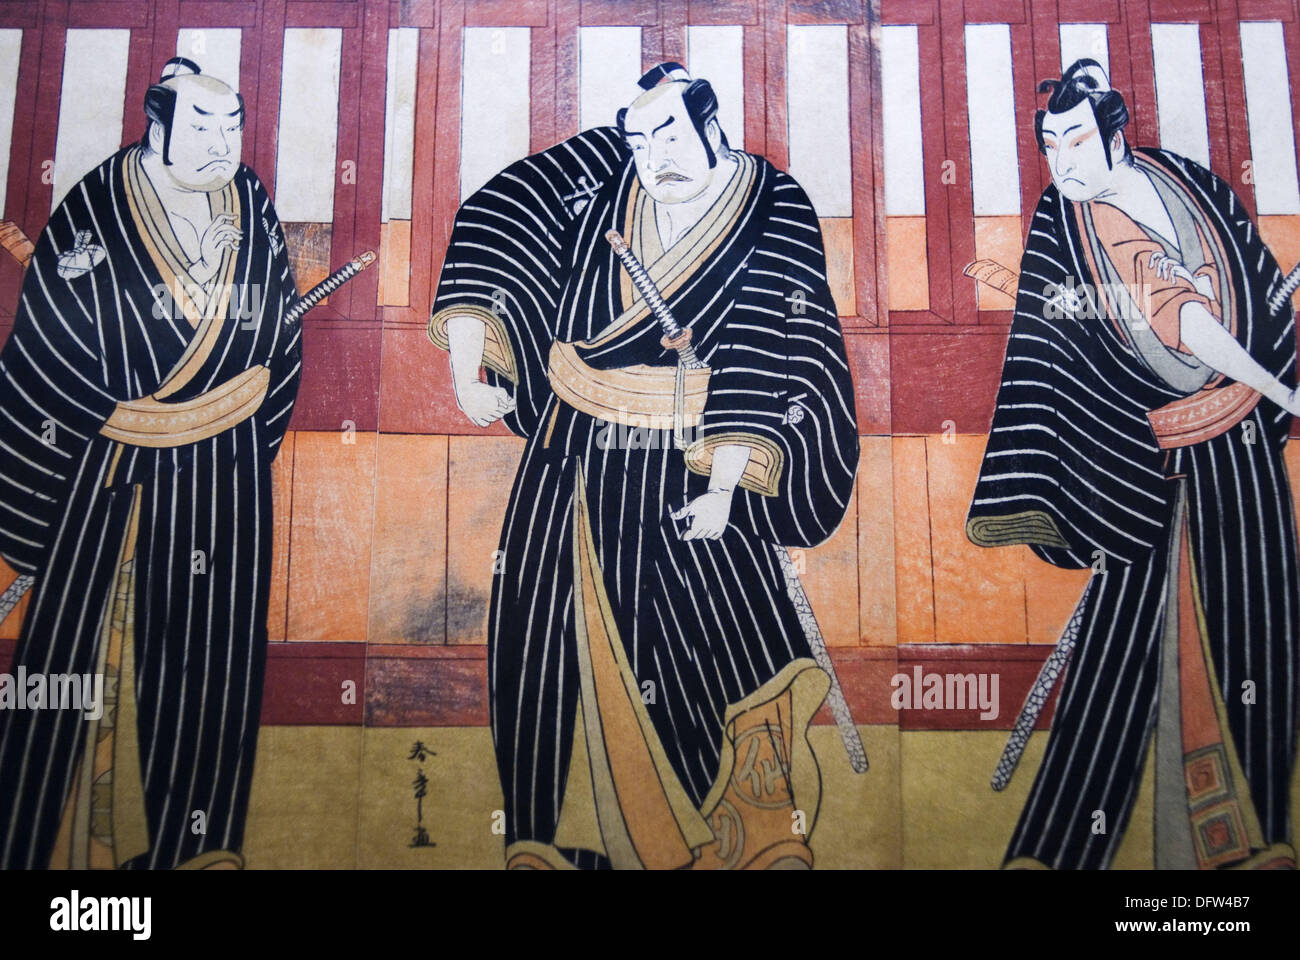 Ukiyo-e (Japanese woodblock prints) featuring ´kabuki´ (classical Japanese dance-drama) in the National Museum, Tokyo, Japan - Stock Image